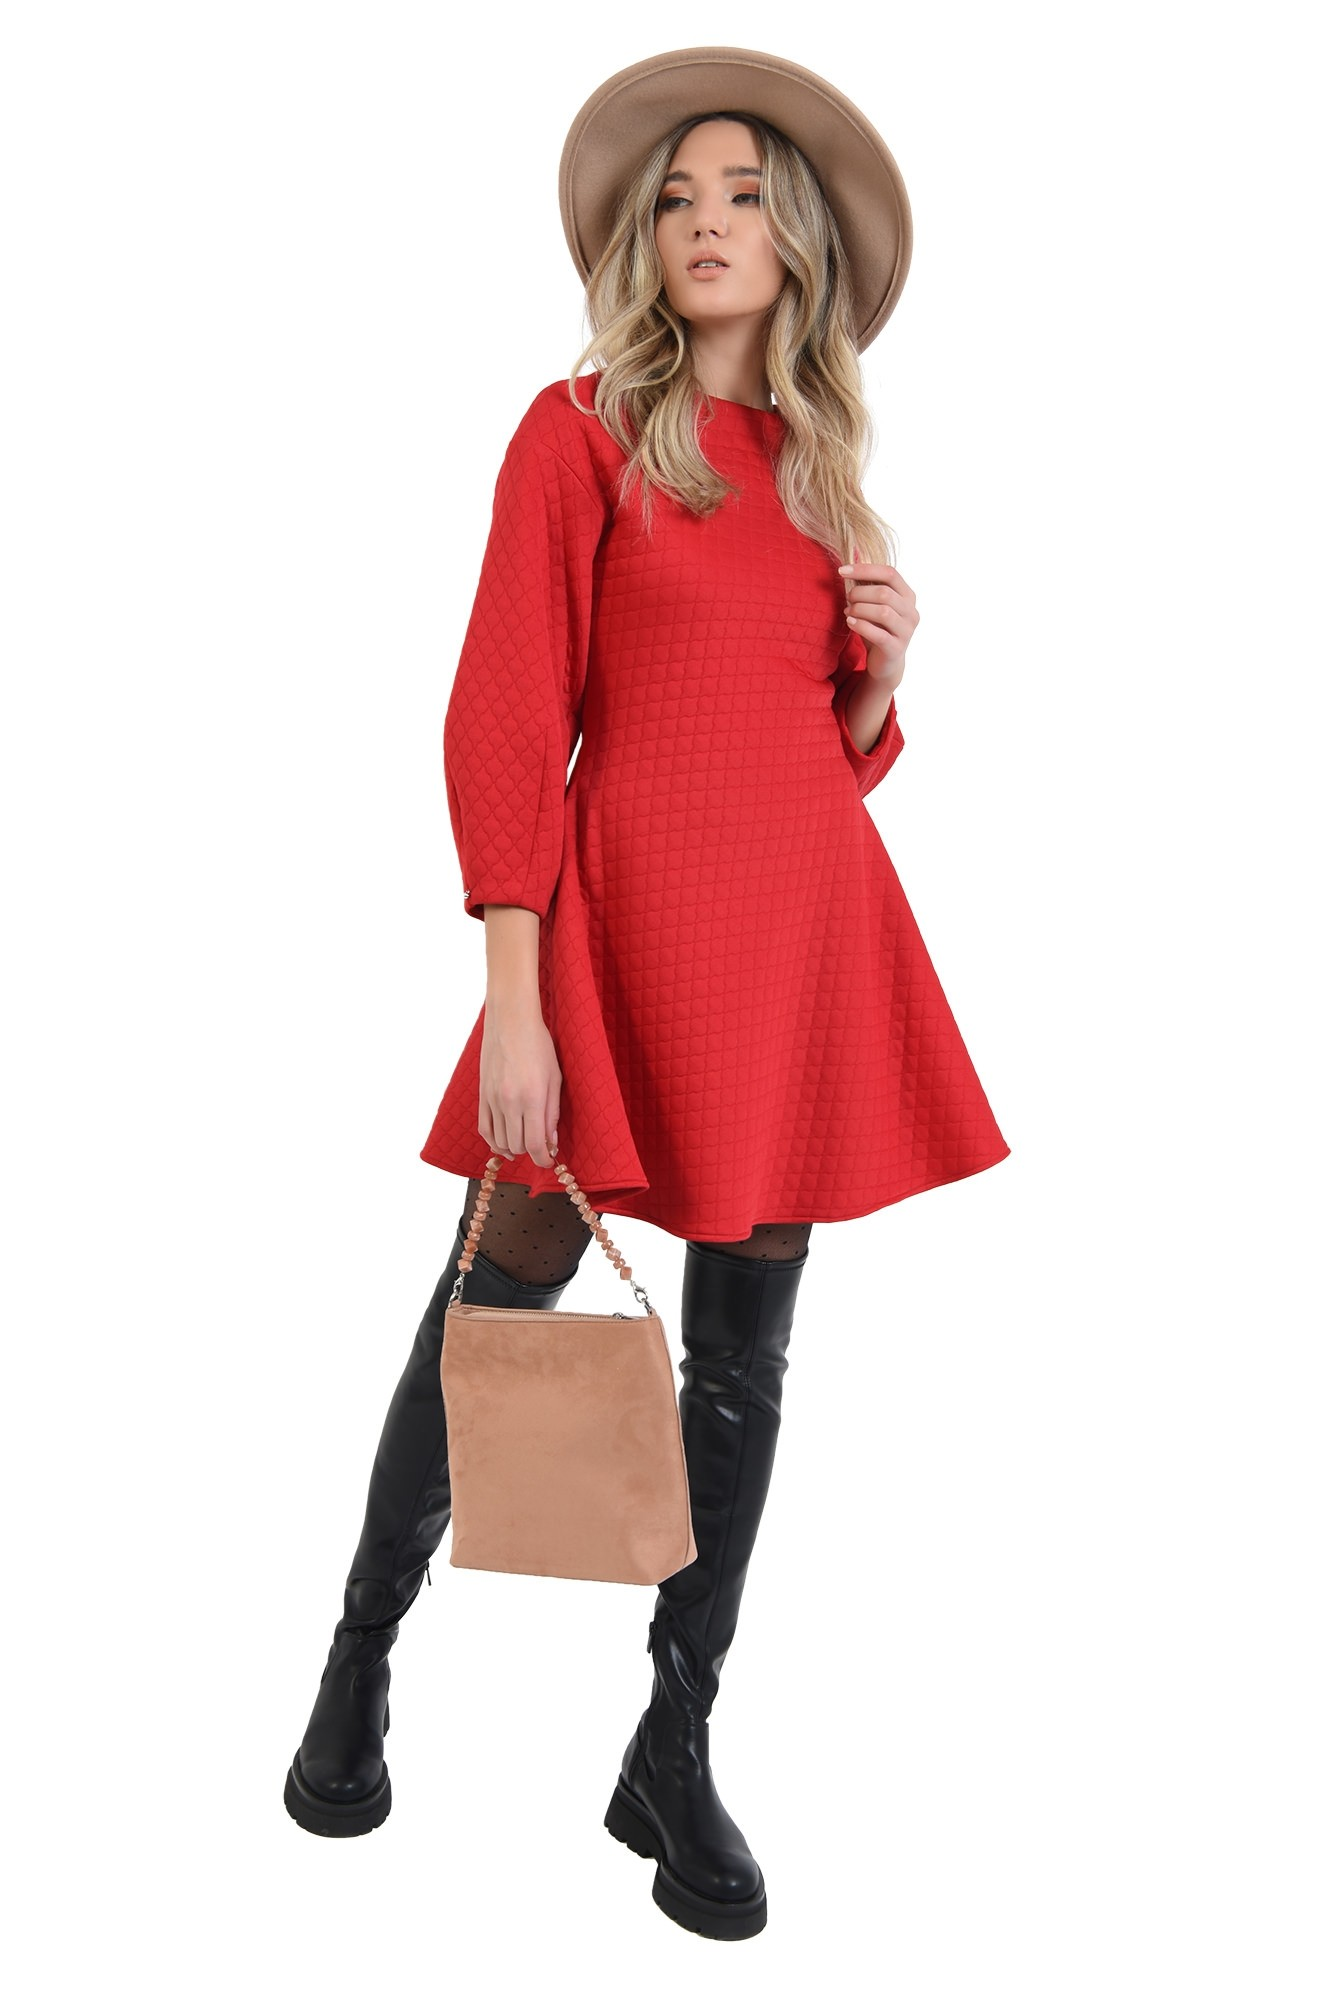 3 - 360 - rochie cu maneci largi, rosie, mini